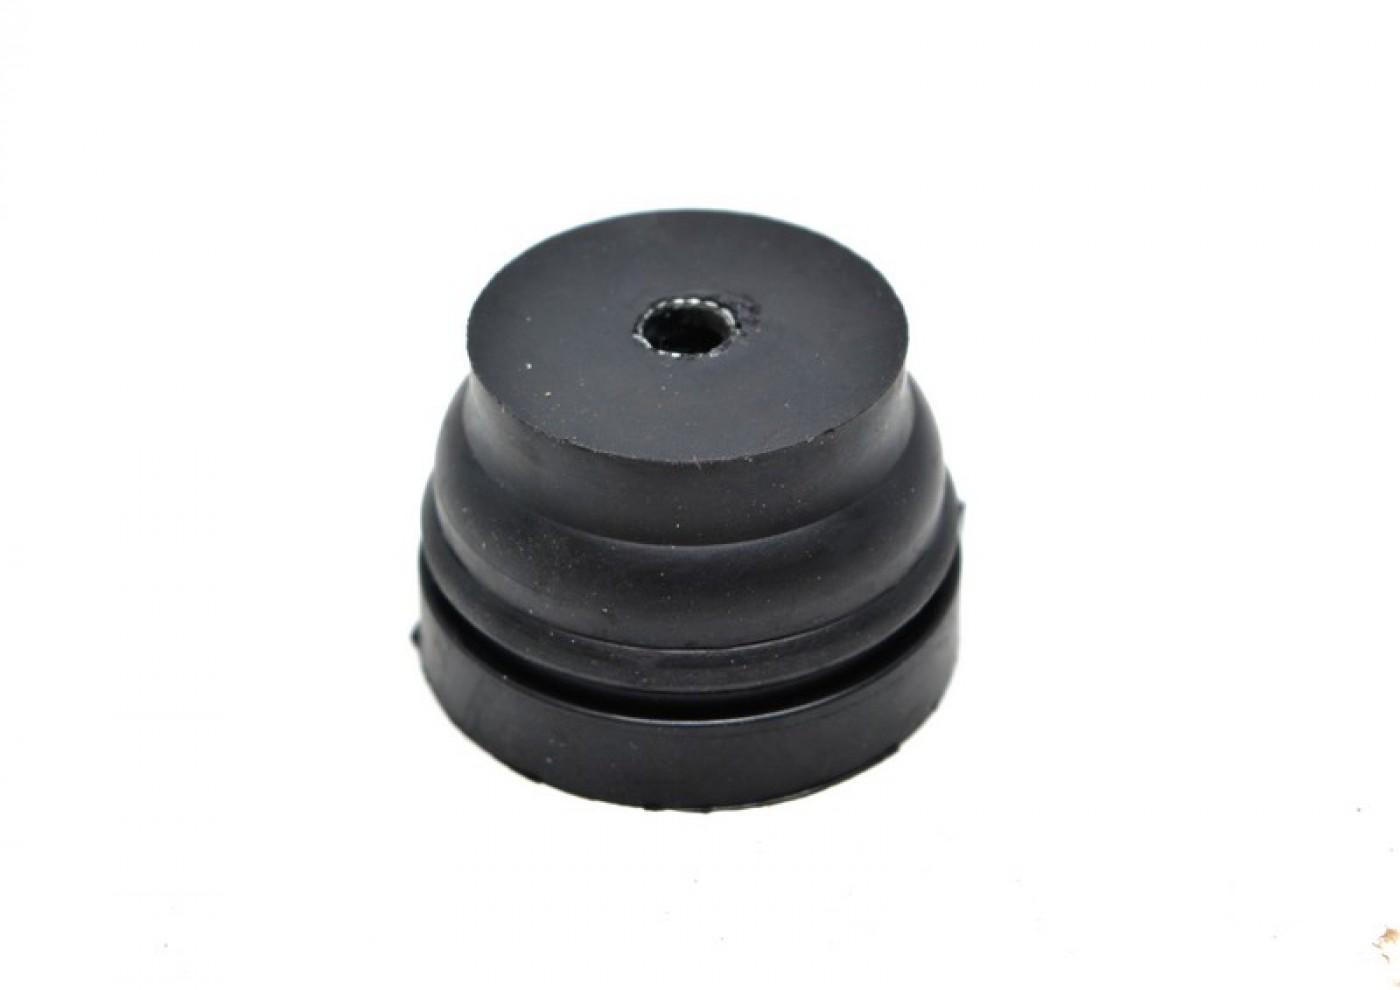 Silenblok Stihl 064, 066, MS640, MS650, MS660, TS700,TS800 - 1122 790 9901